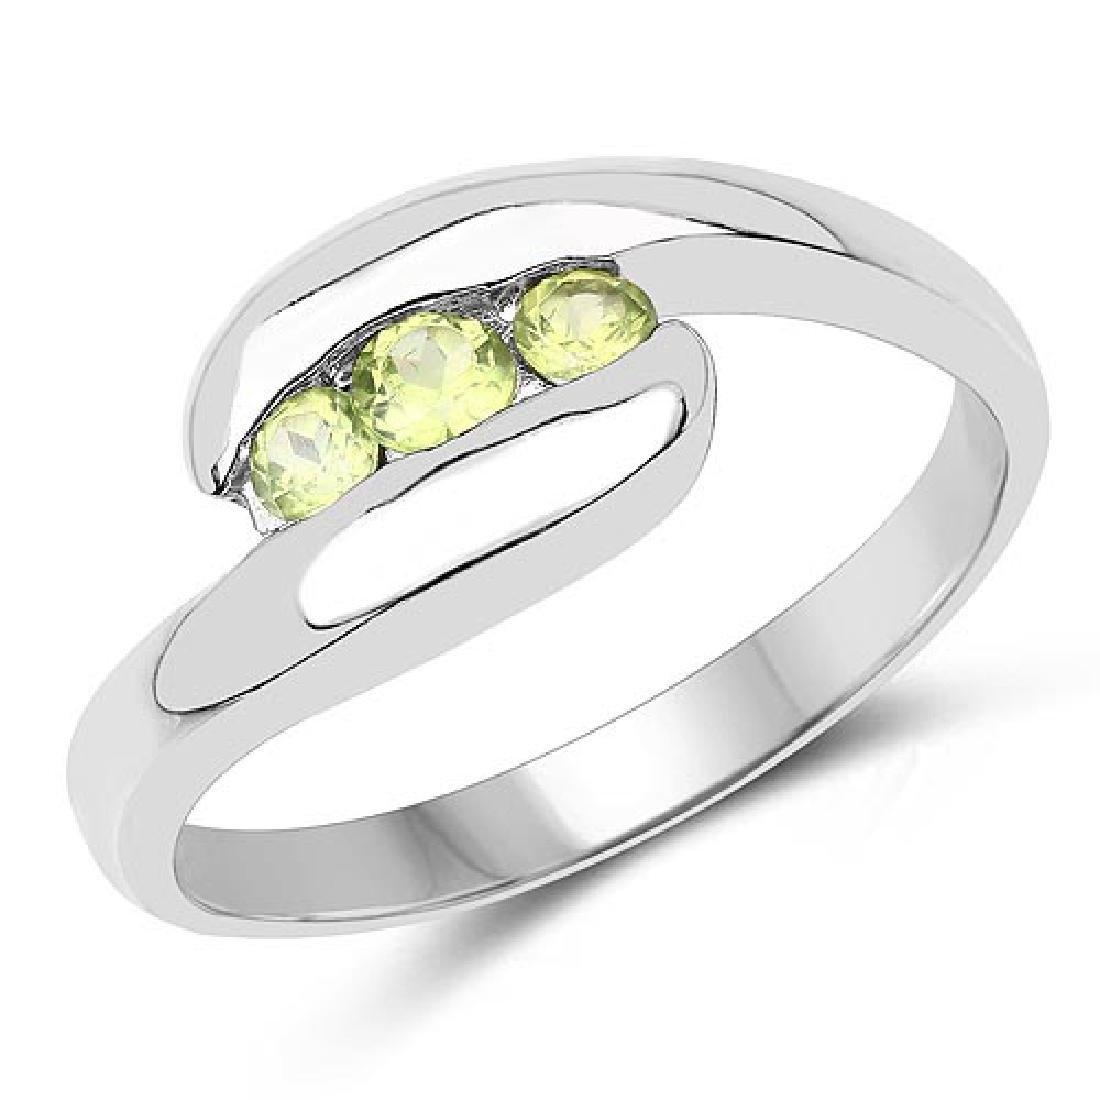 0.56 Carat Genuine Peridot .925 Sterling Silver Ring